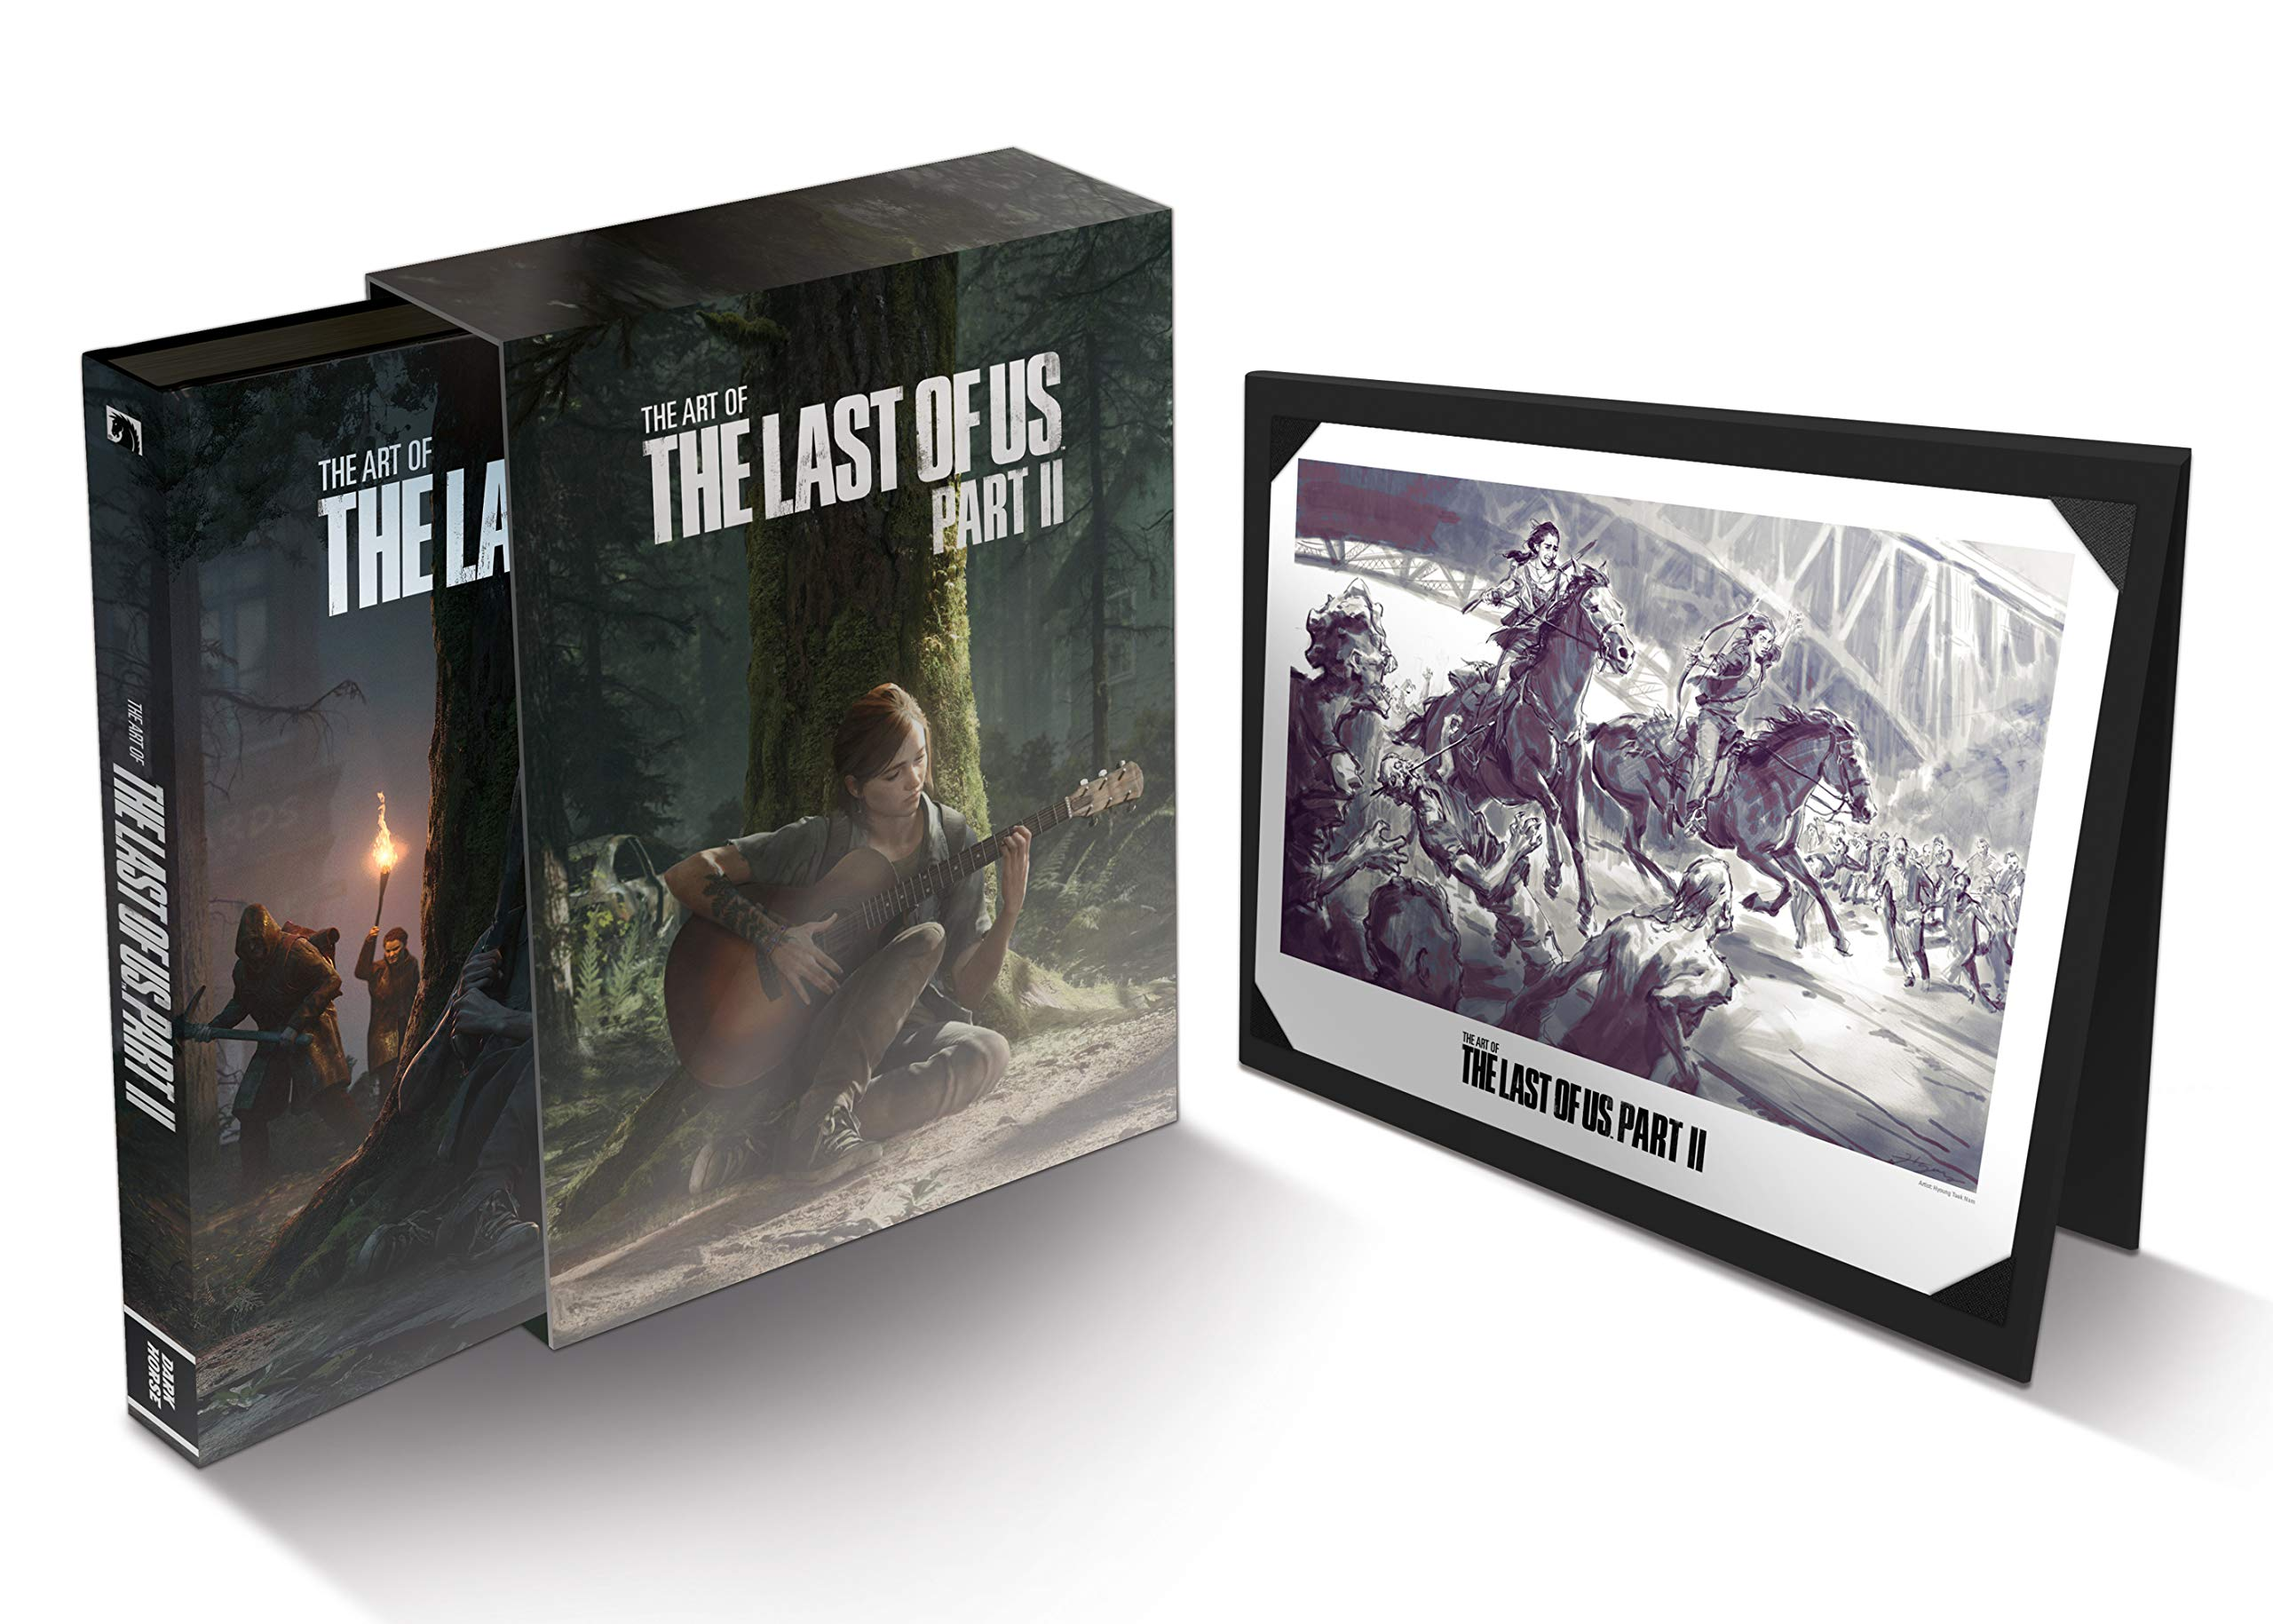 Dark Horse анонсировало Deluxe-издание артбука The Last of Us Part 2